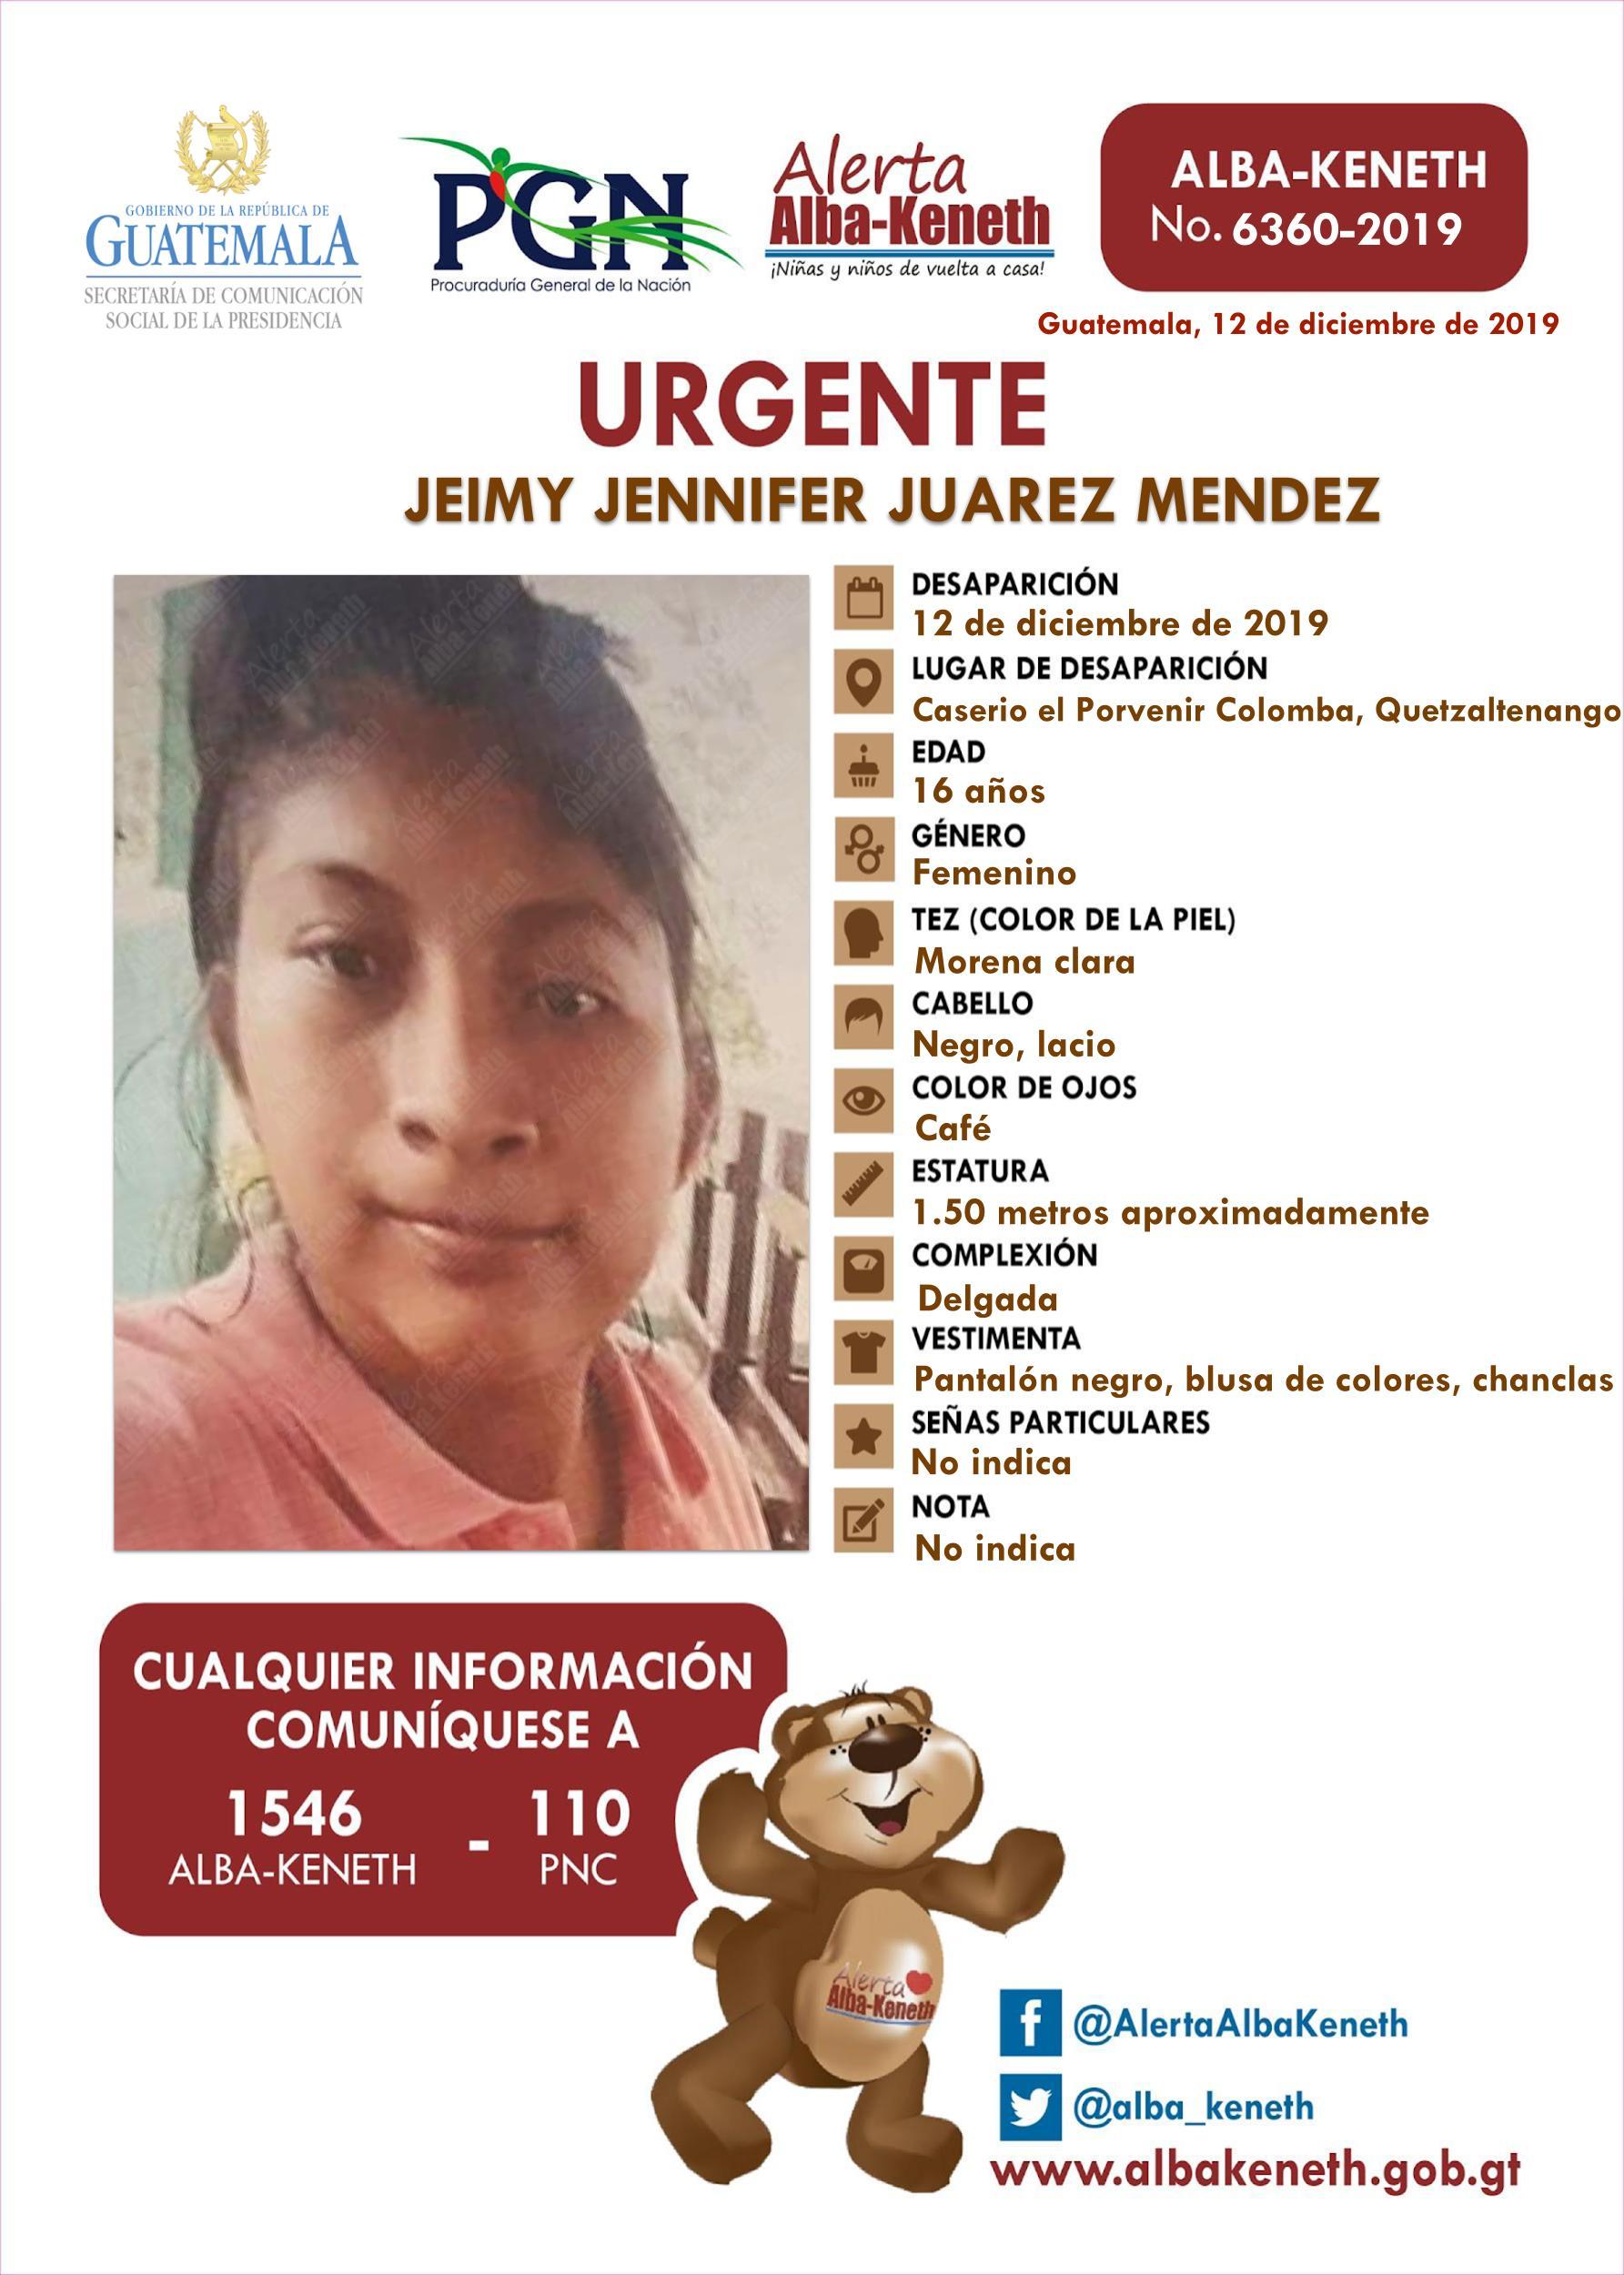 Jeimy Jennifer Juarez Mendez